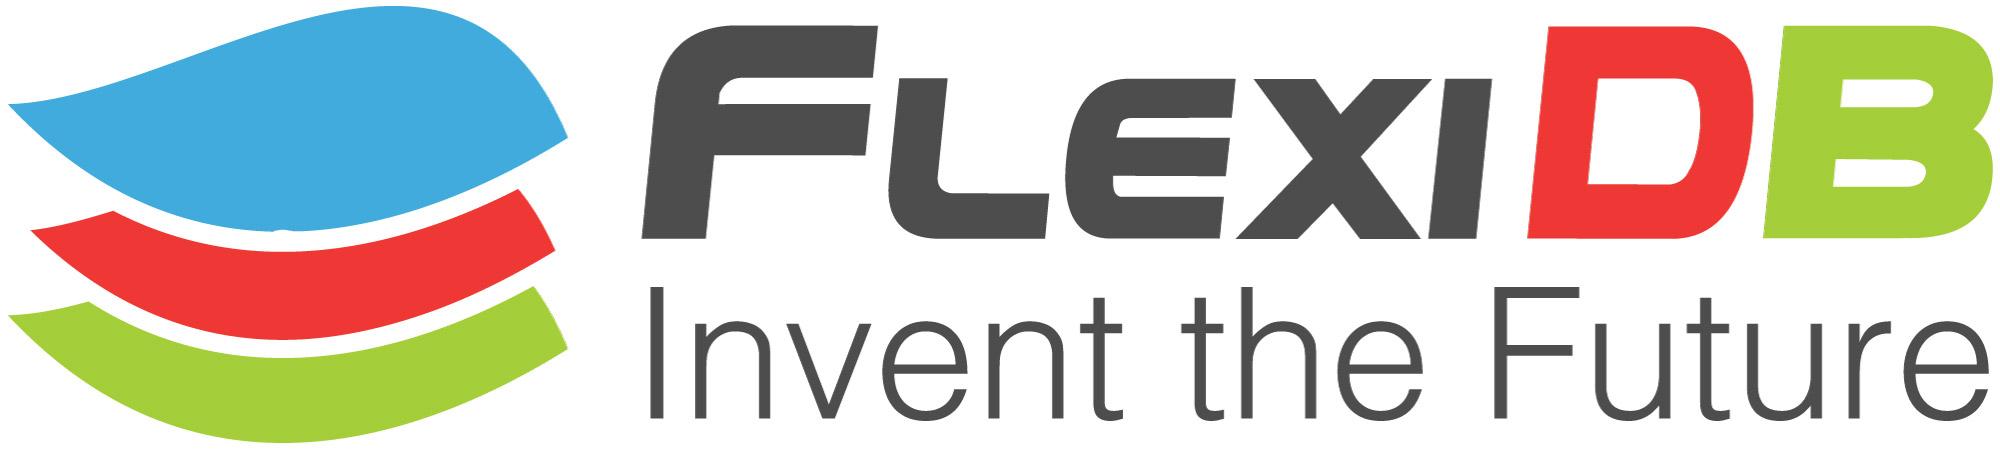 FlexiDB